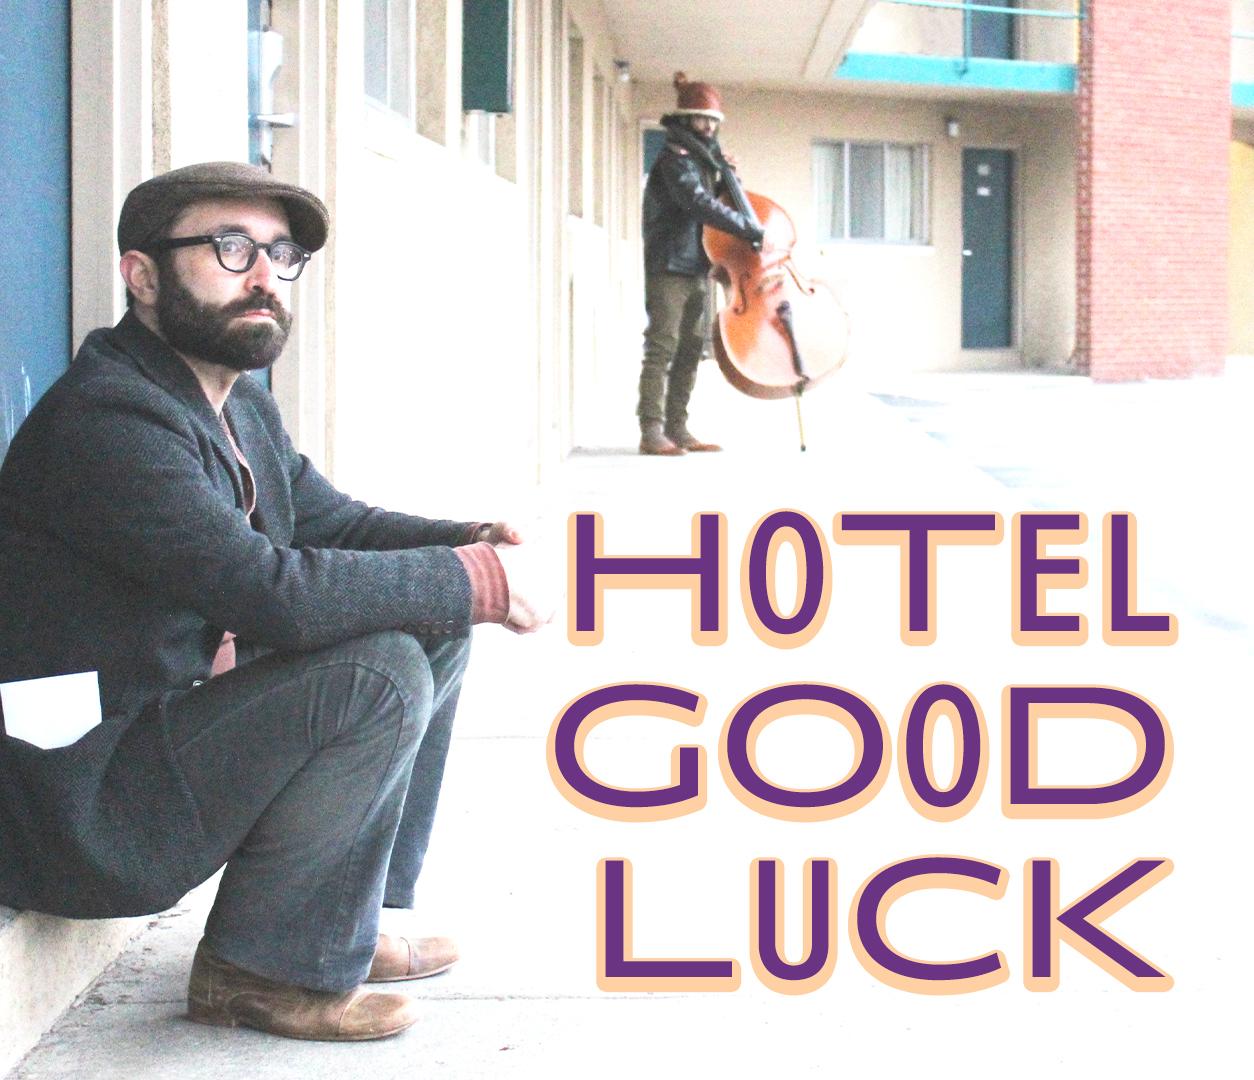 Hotel Good Luck